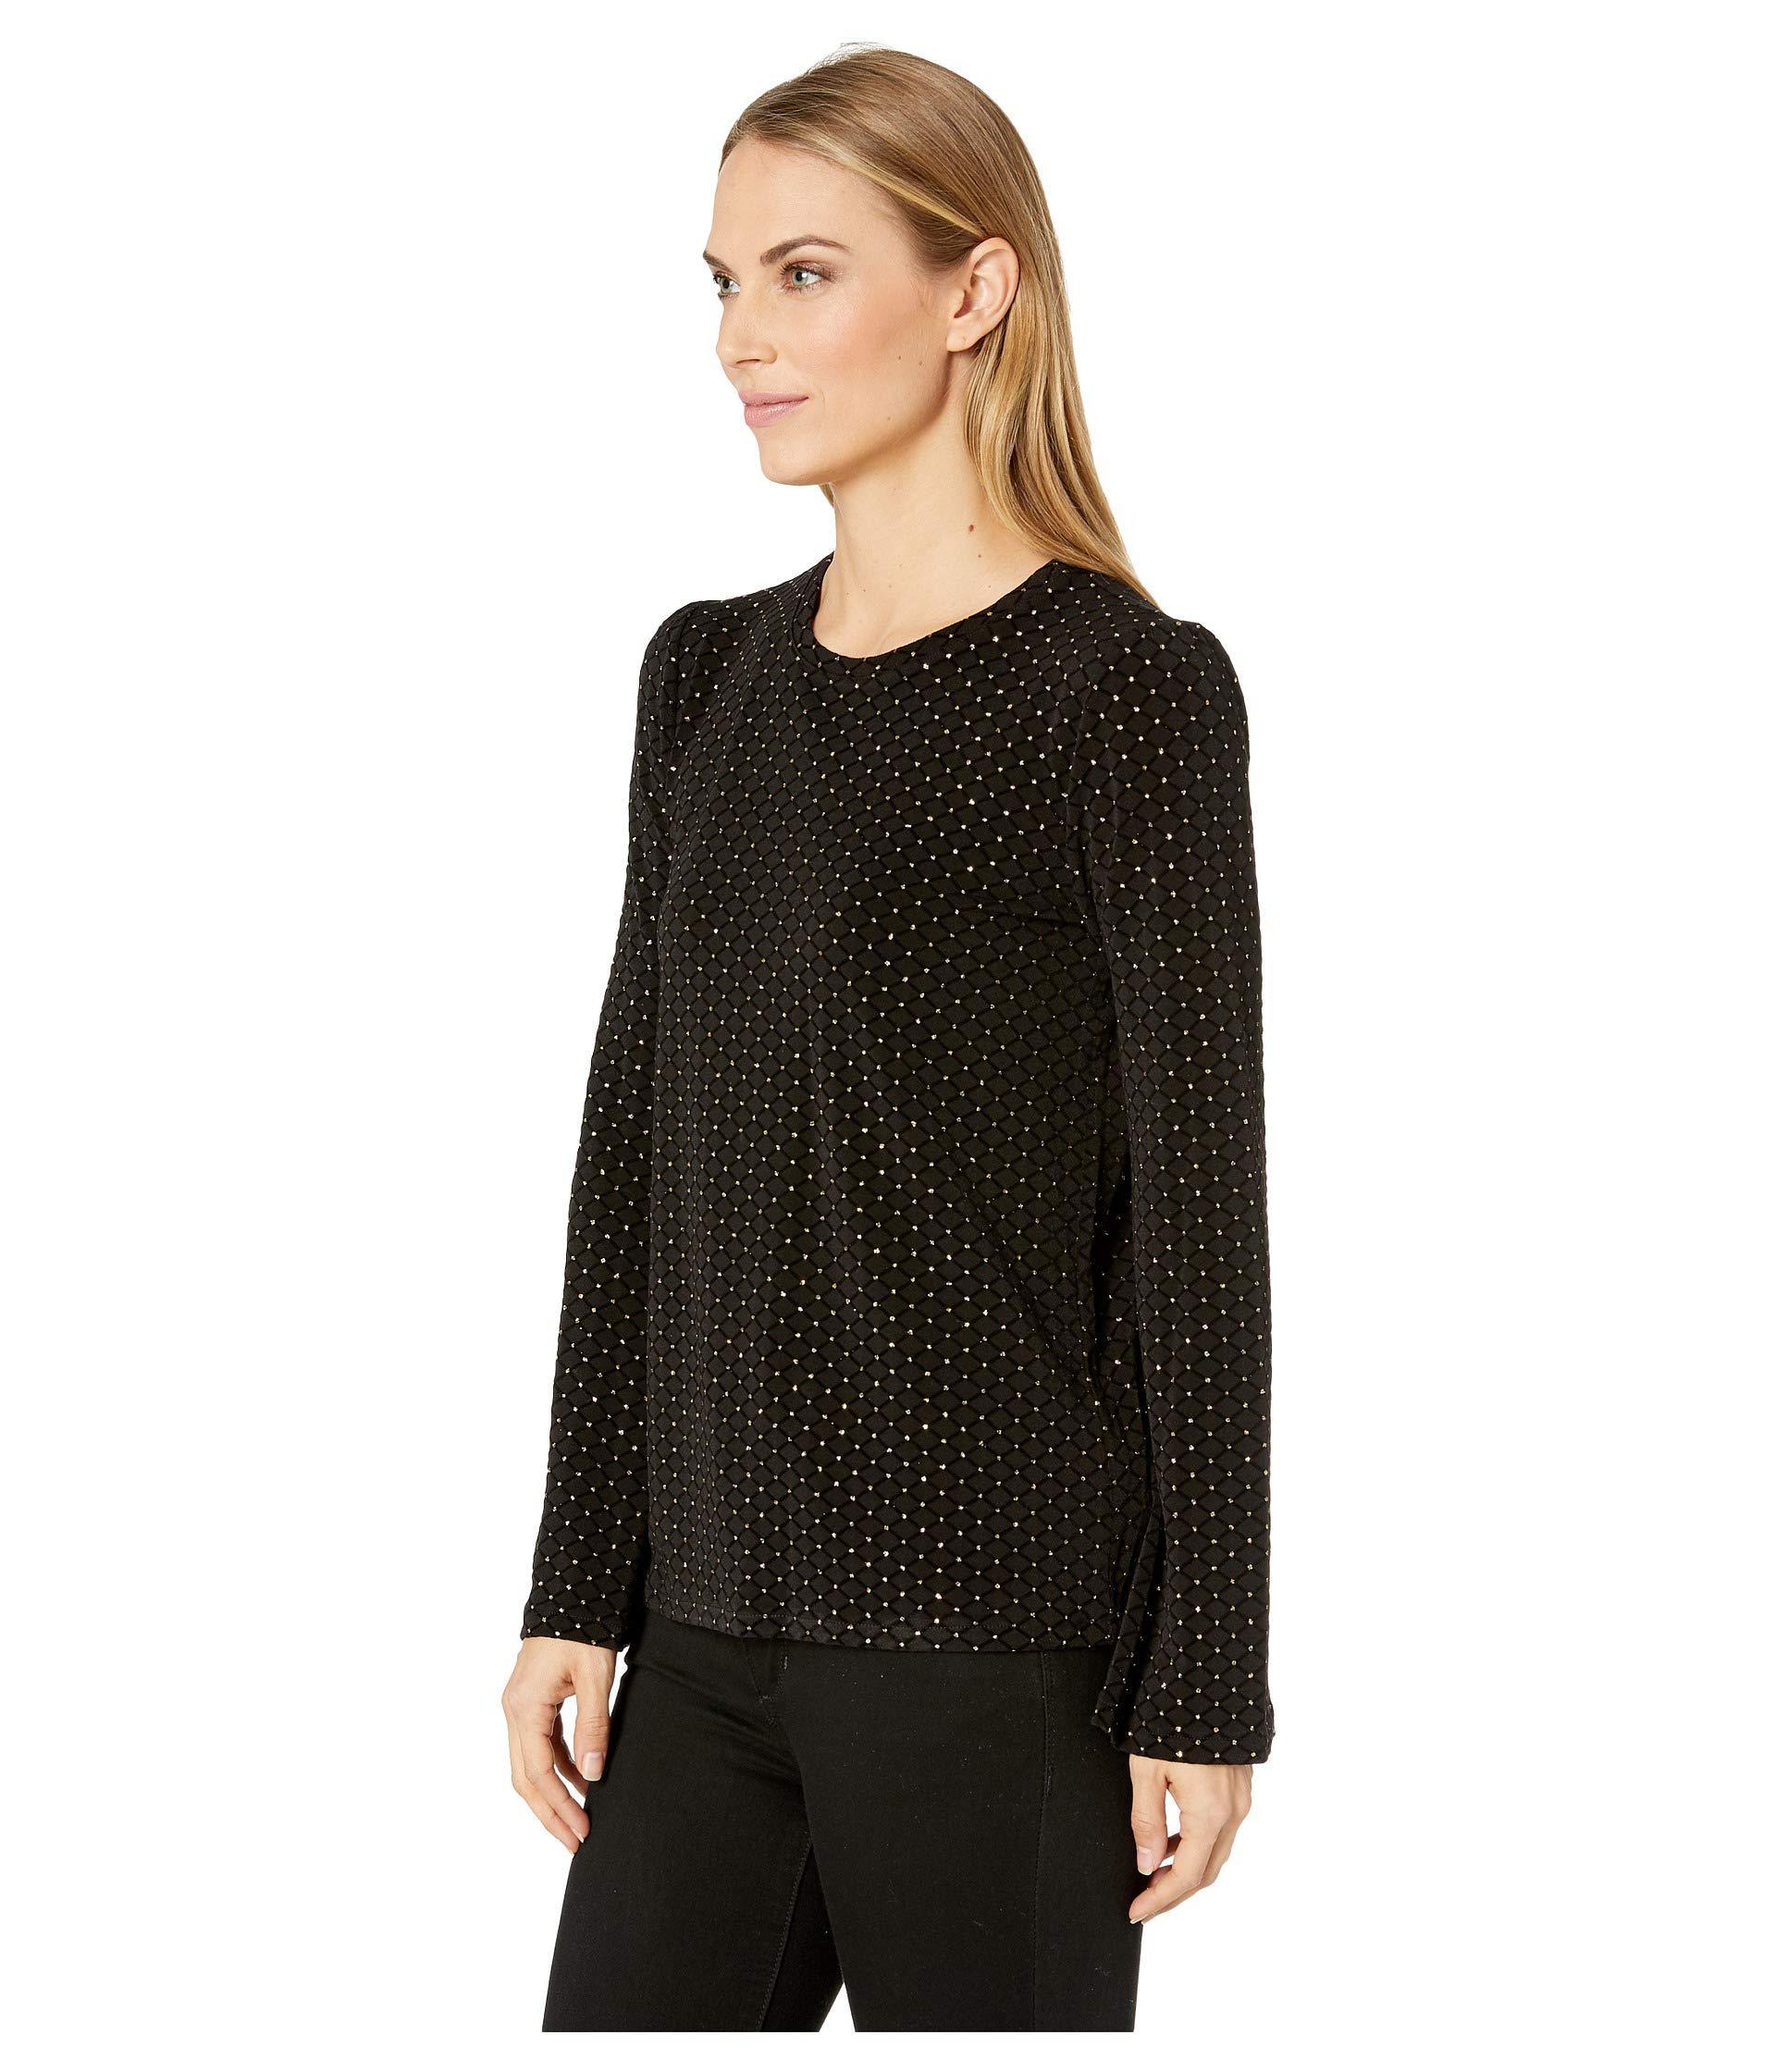 80955ef6d5c Lyst - MICHAEL Michael Kors Easy Bell Sleeve Long Sleeve Top (black gold)  Women s Clothing in Black